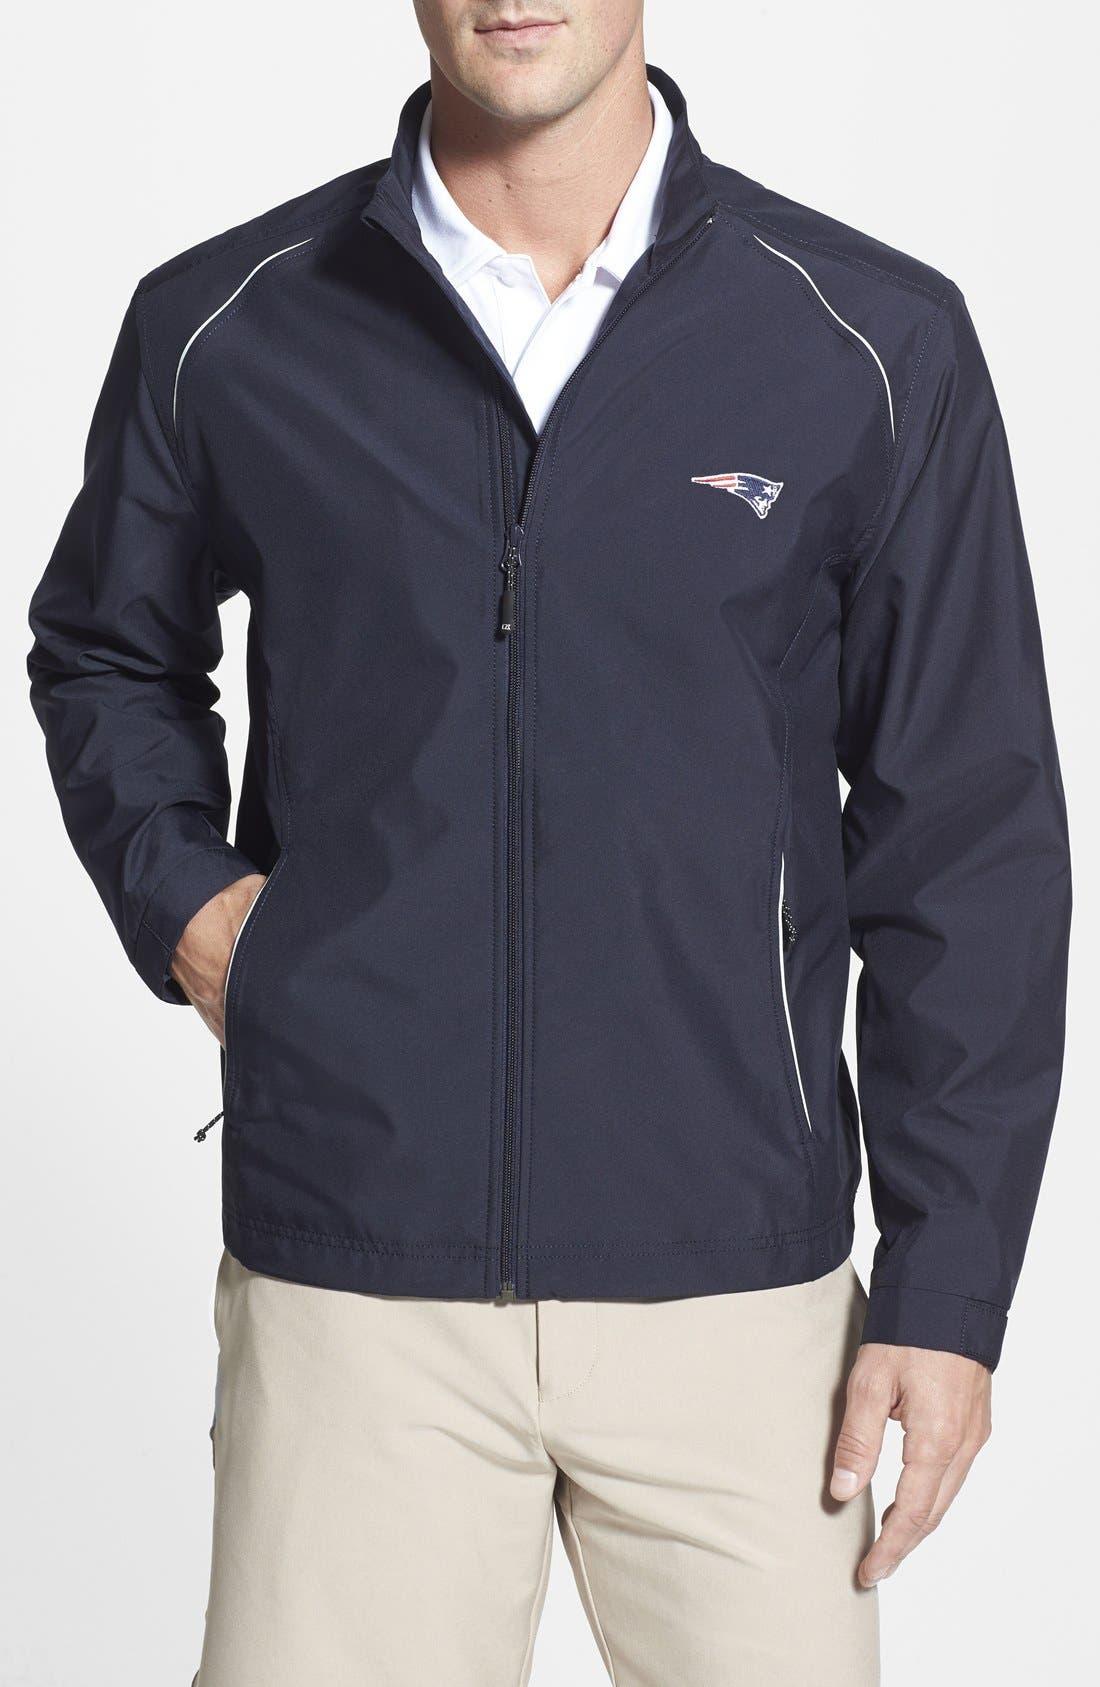 Cutter & Buck New England Patriots - Beacon WeatherTec Wind & Water Resistant Jacket